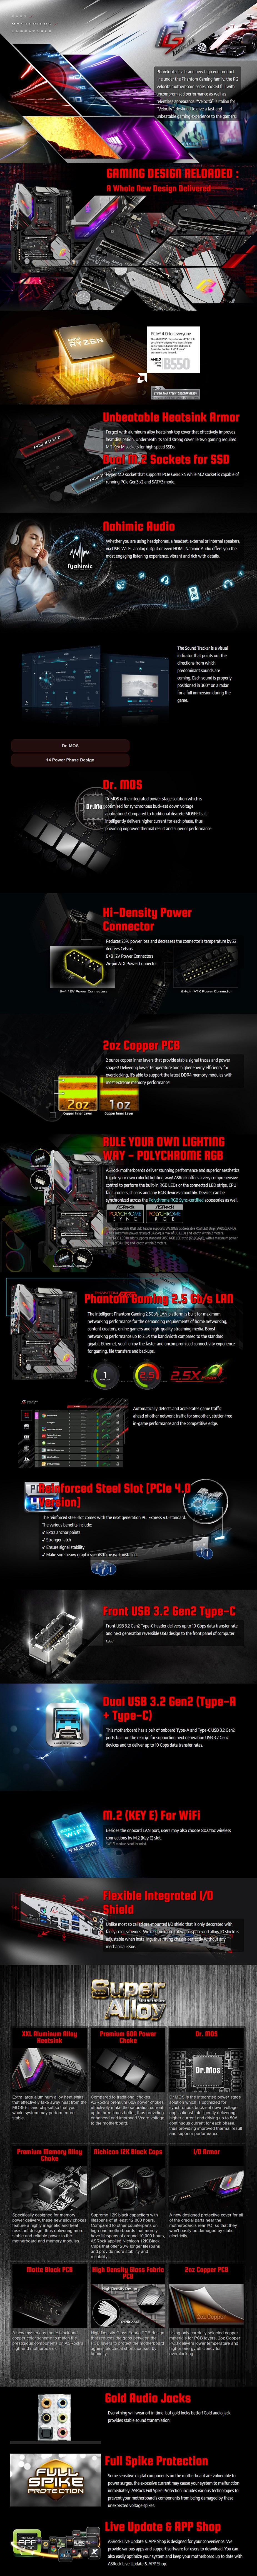 asrock-b550-pg-velocita-am4-atx-motherboard-ac35647-8.jpg